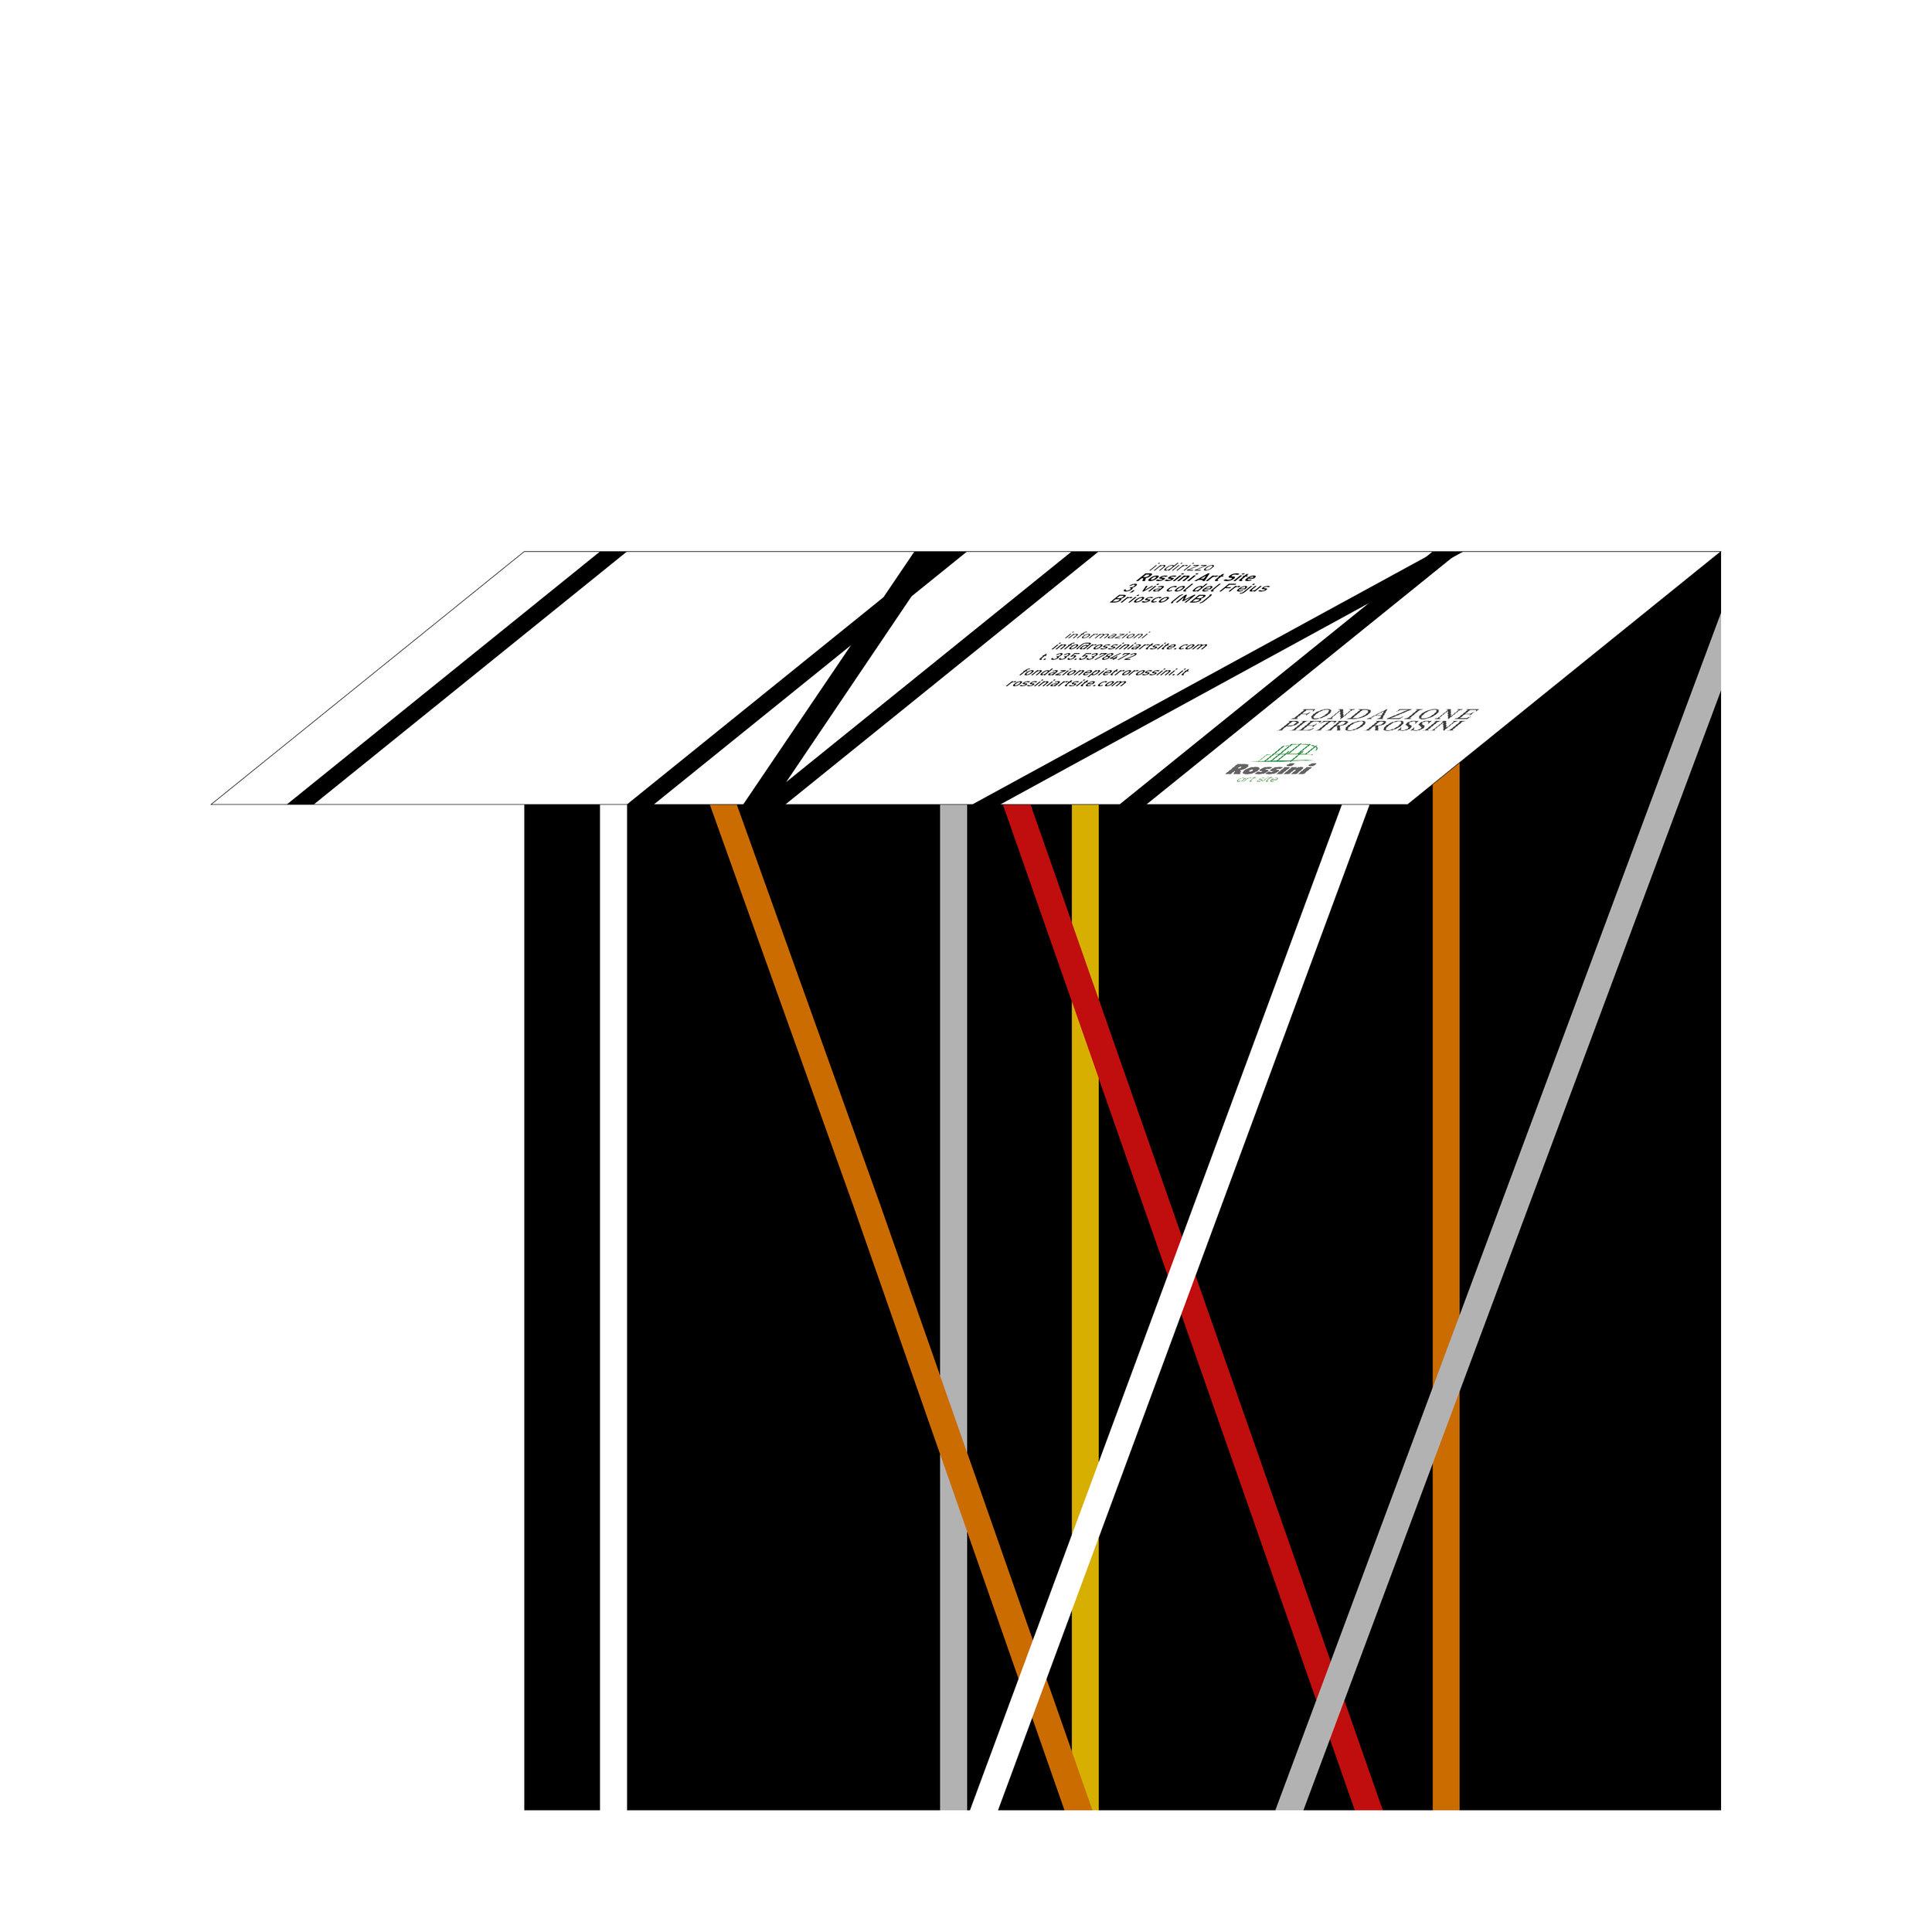 Sesma_sequenza web3.jpg